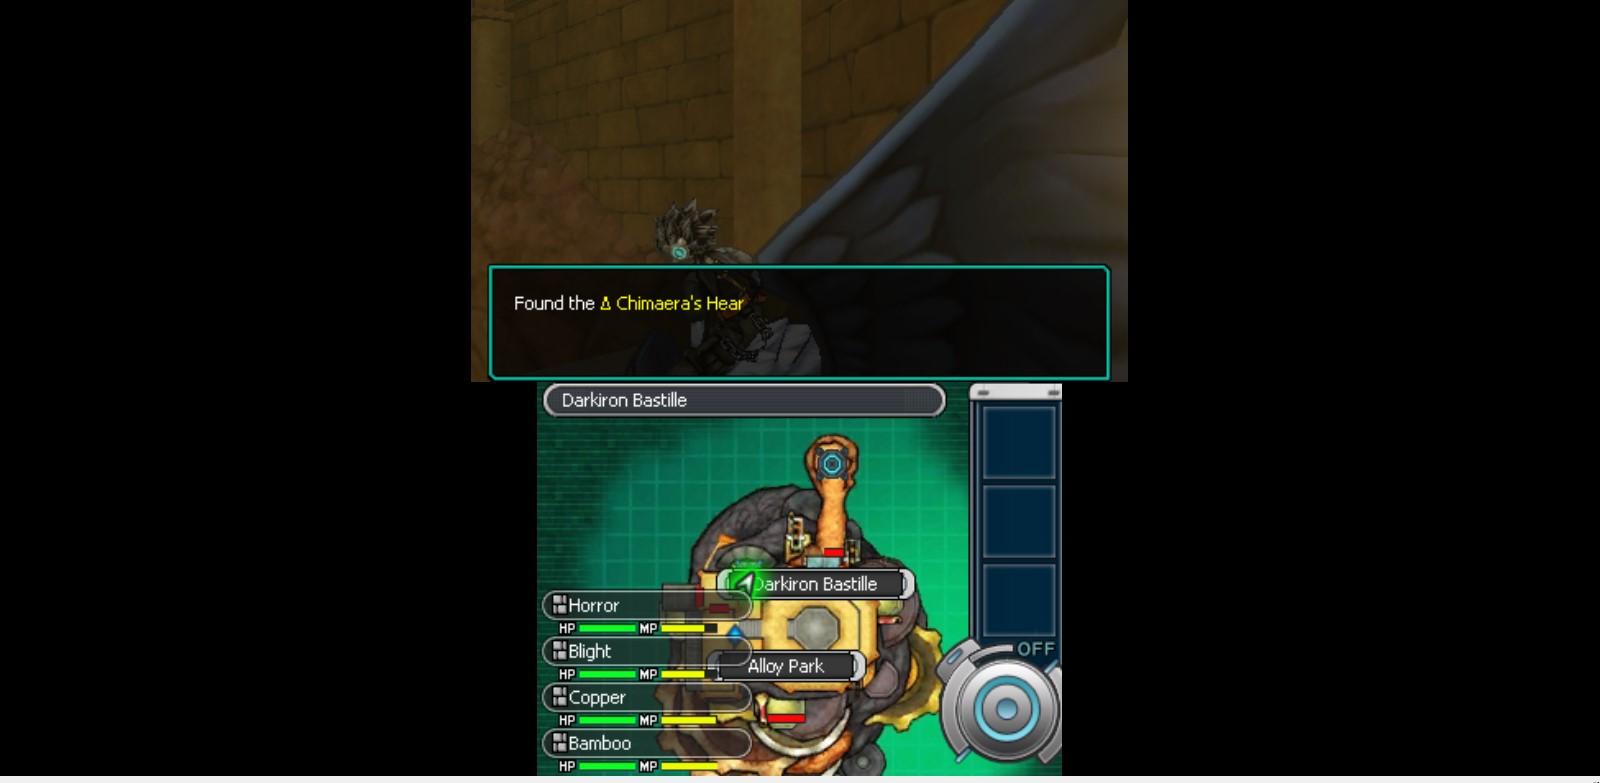 DQM Joker 3, game crash when opening a stealth box at Darkiron